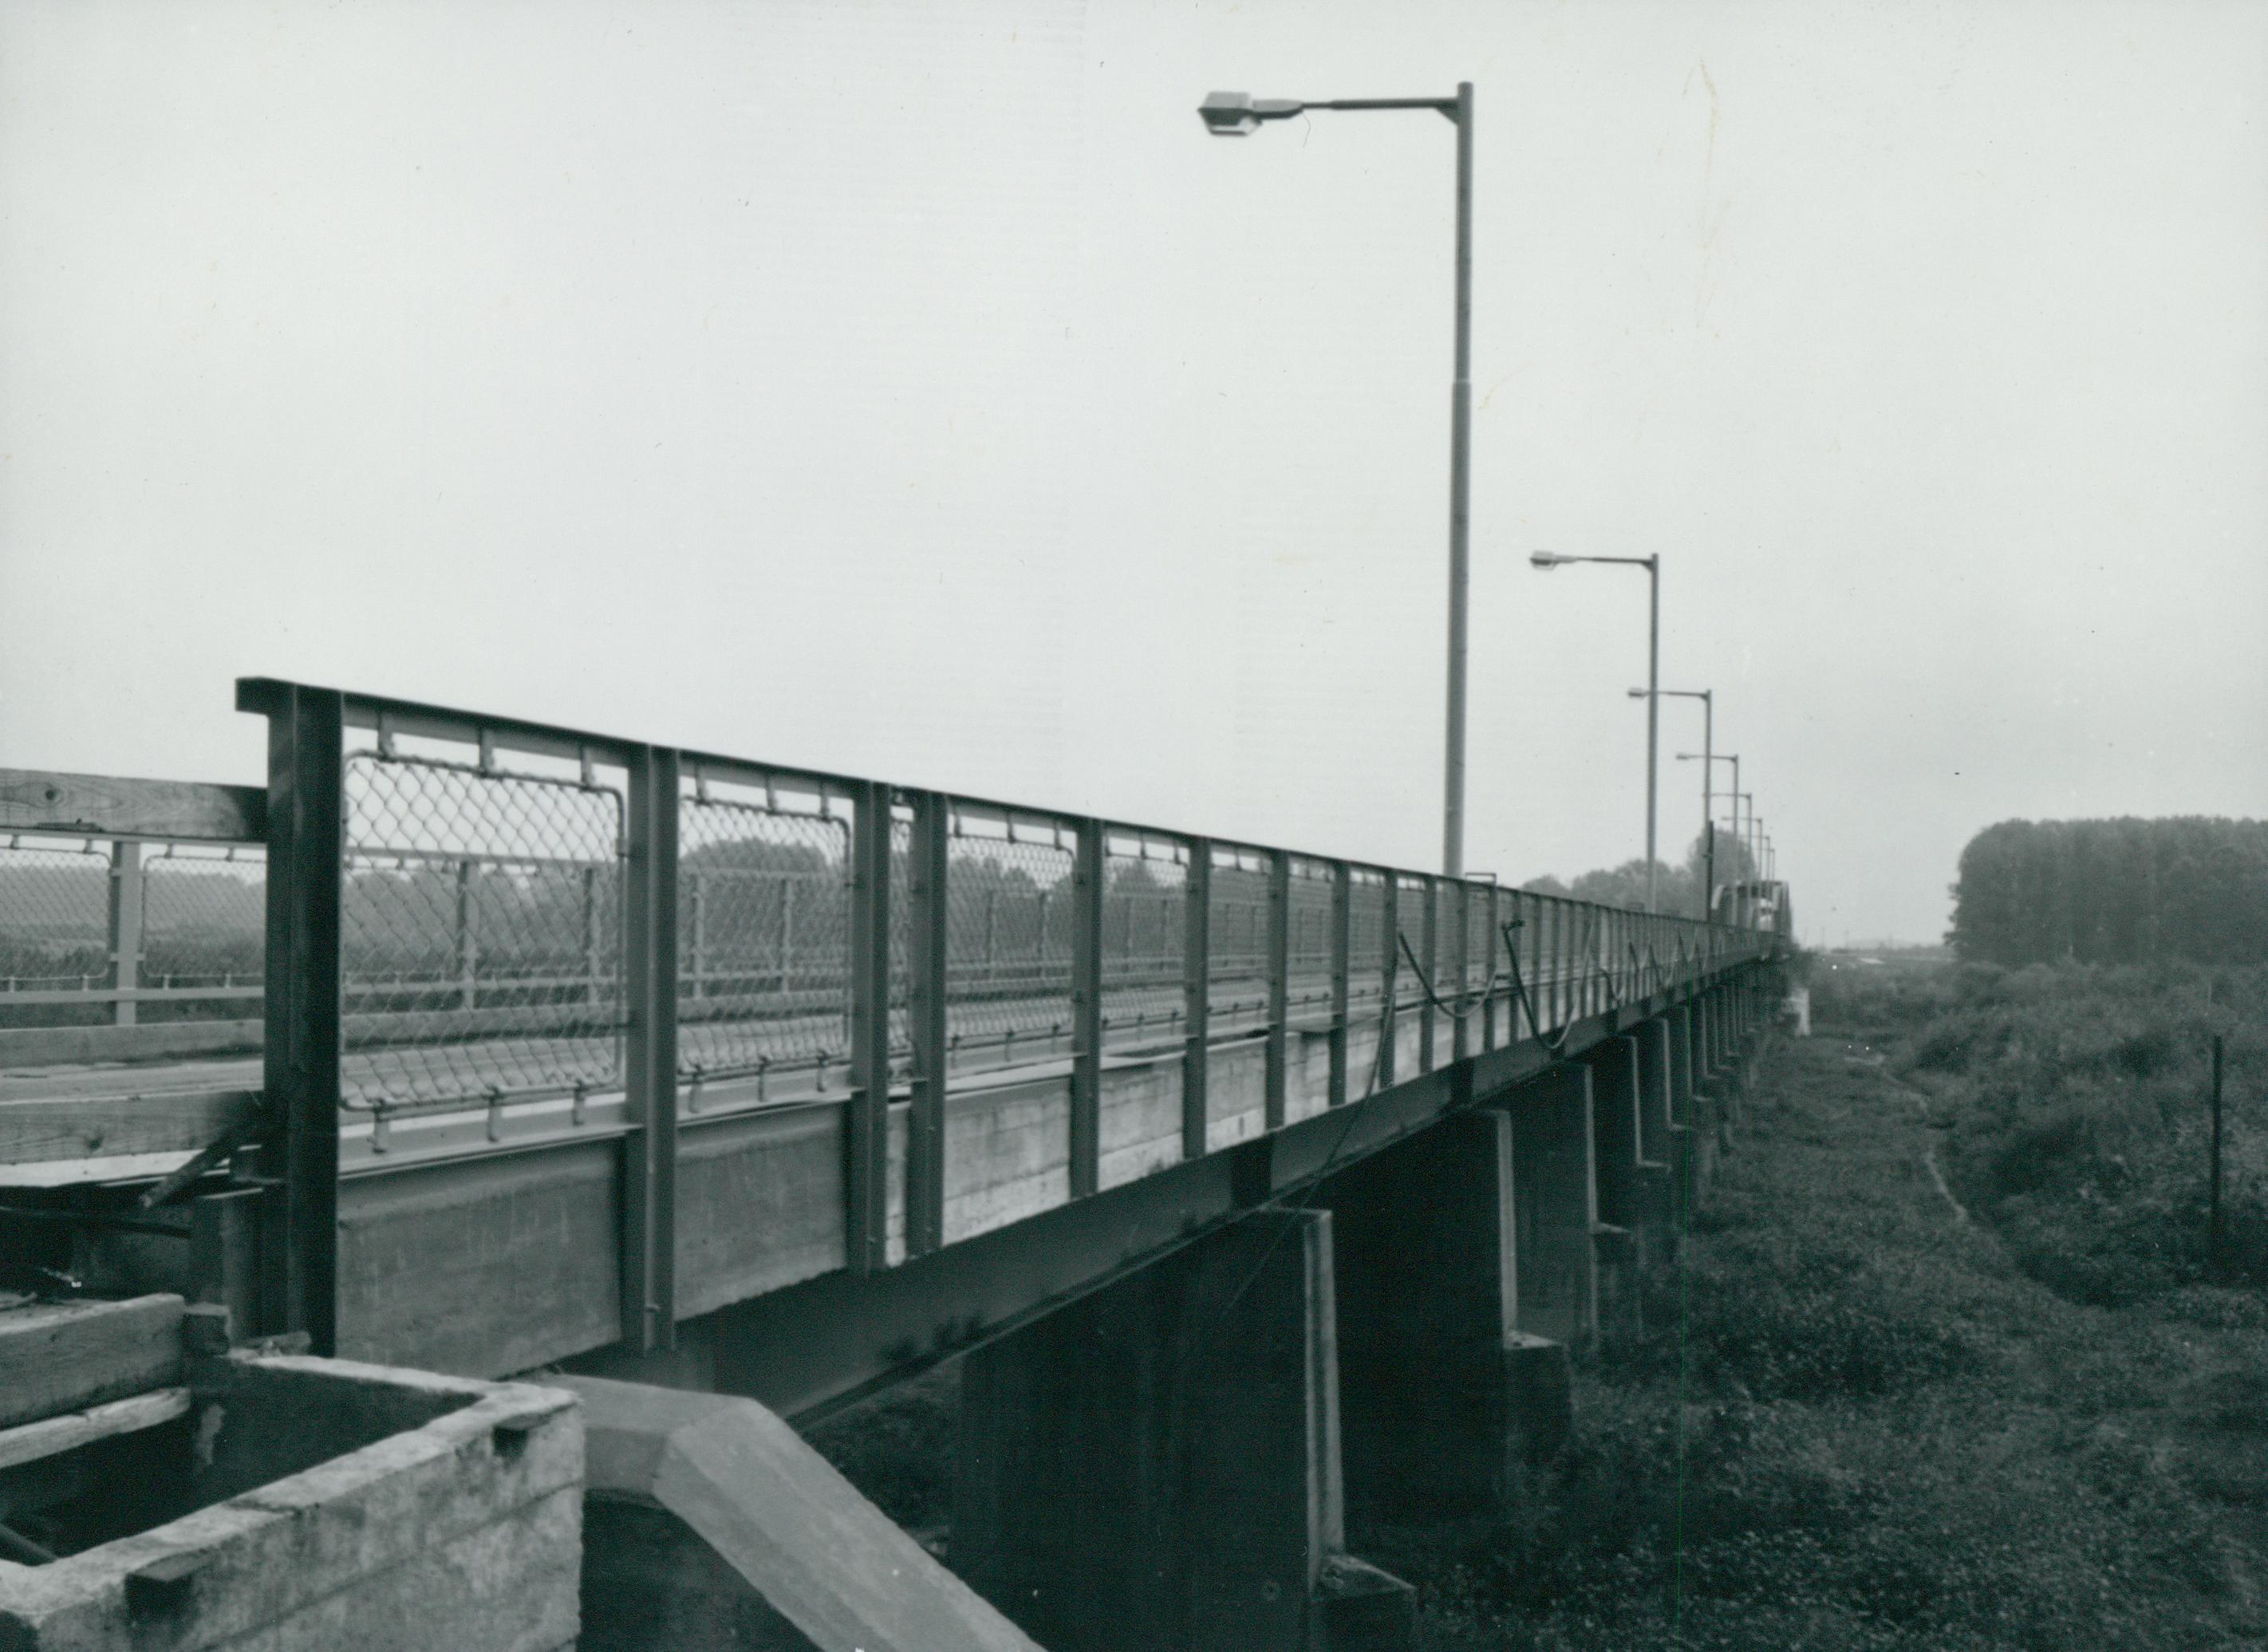 A kiskörei vasúti-híd építése